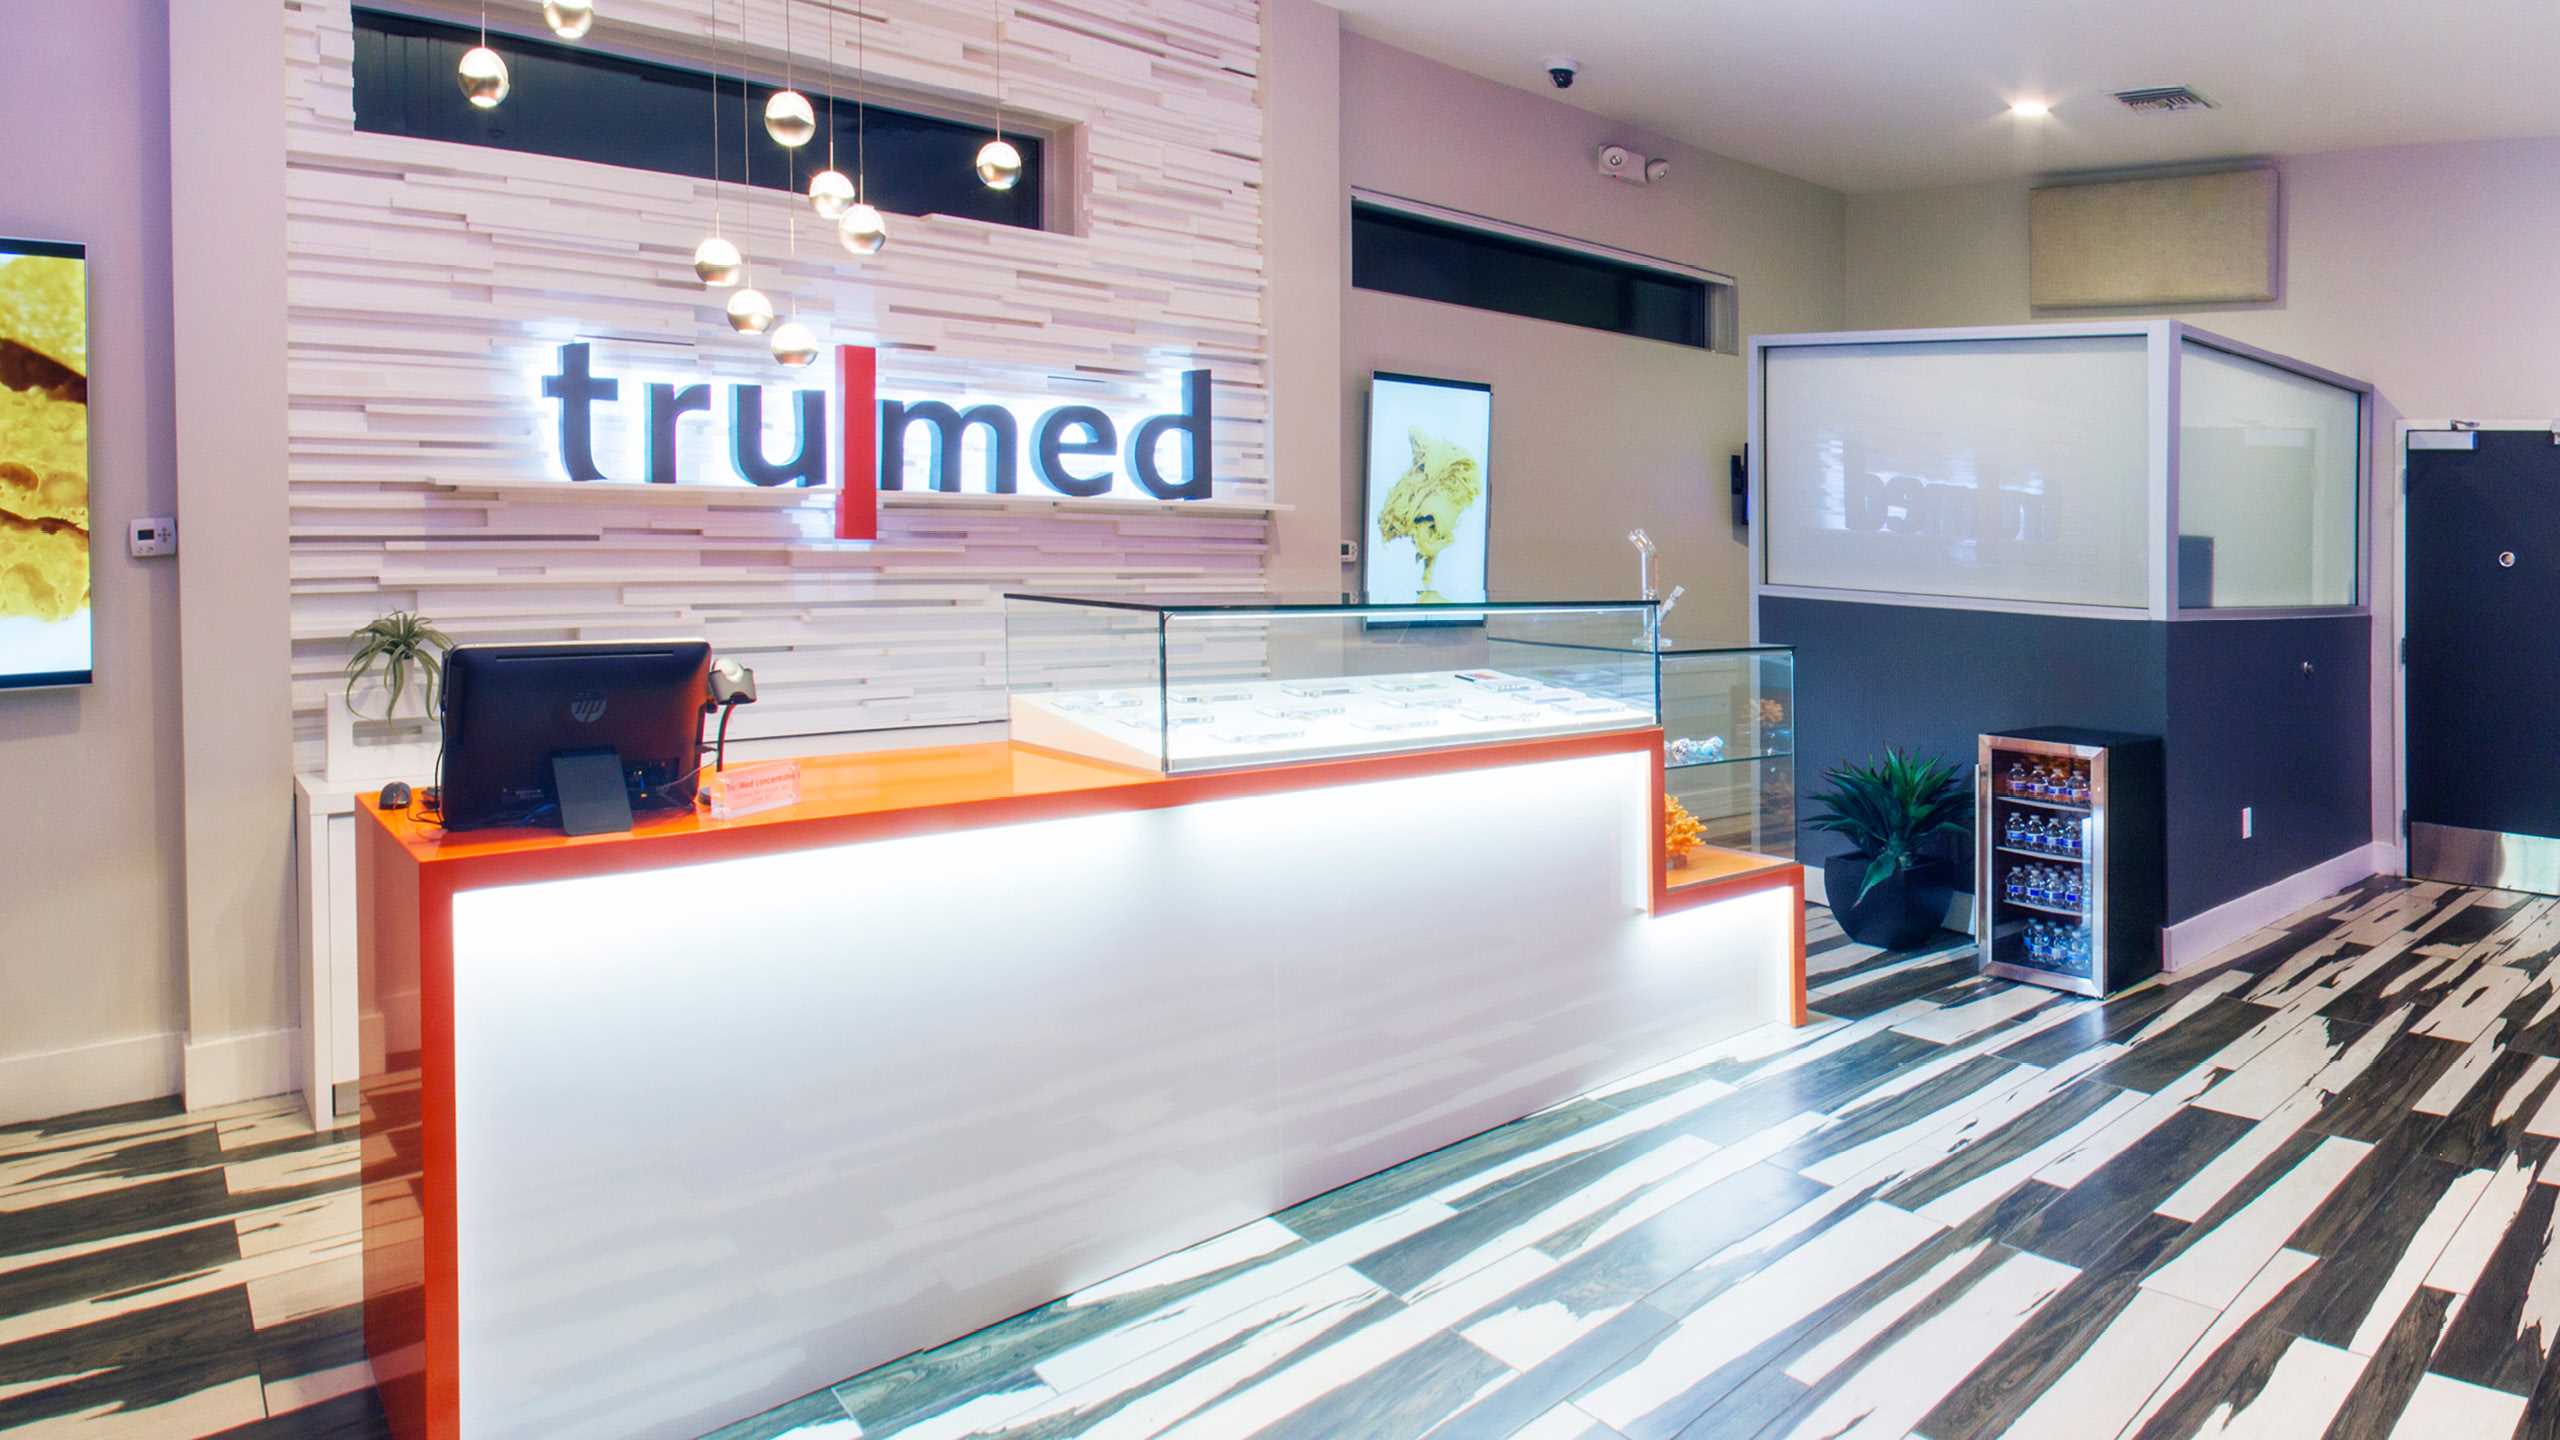 TruMed Dispensary Interior Design by High Road Design Studio